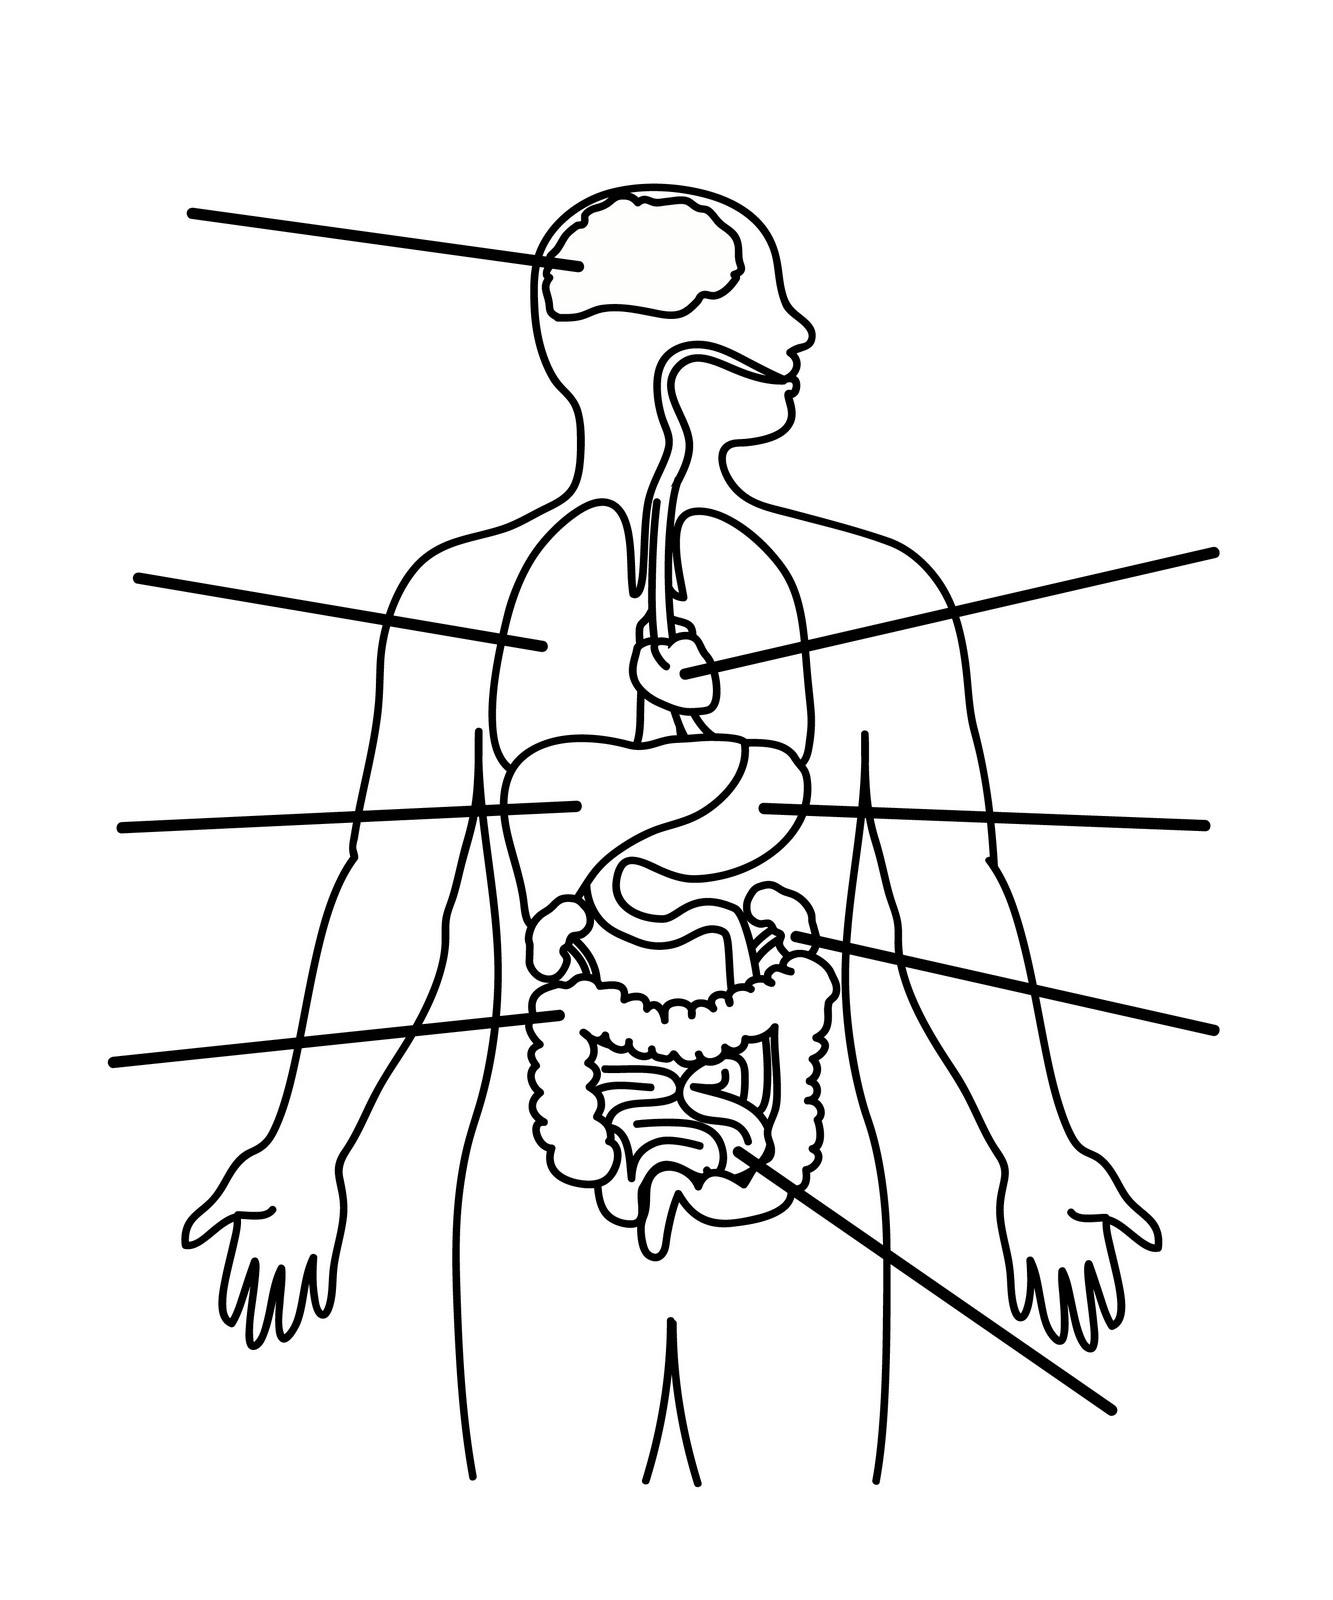 1333x1600 Drawing Of Human Body